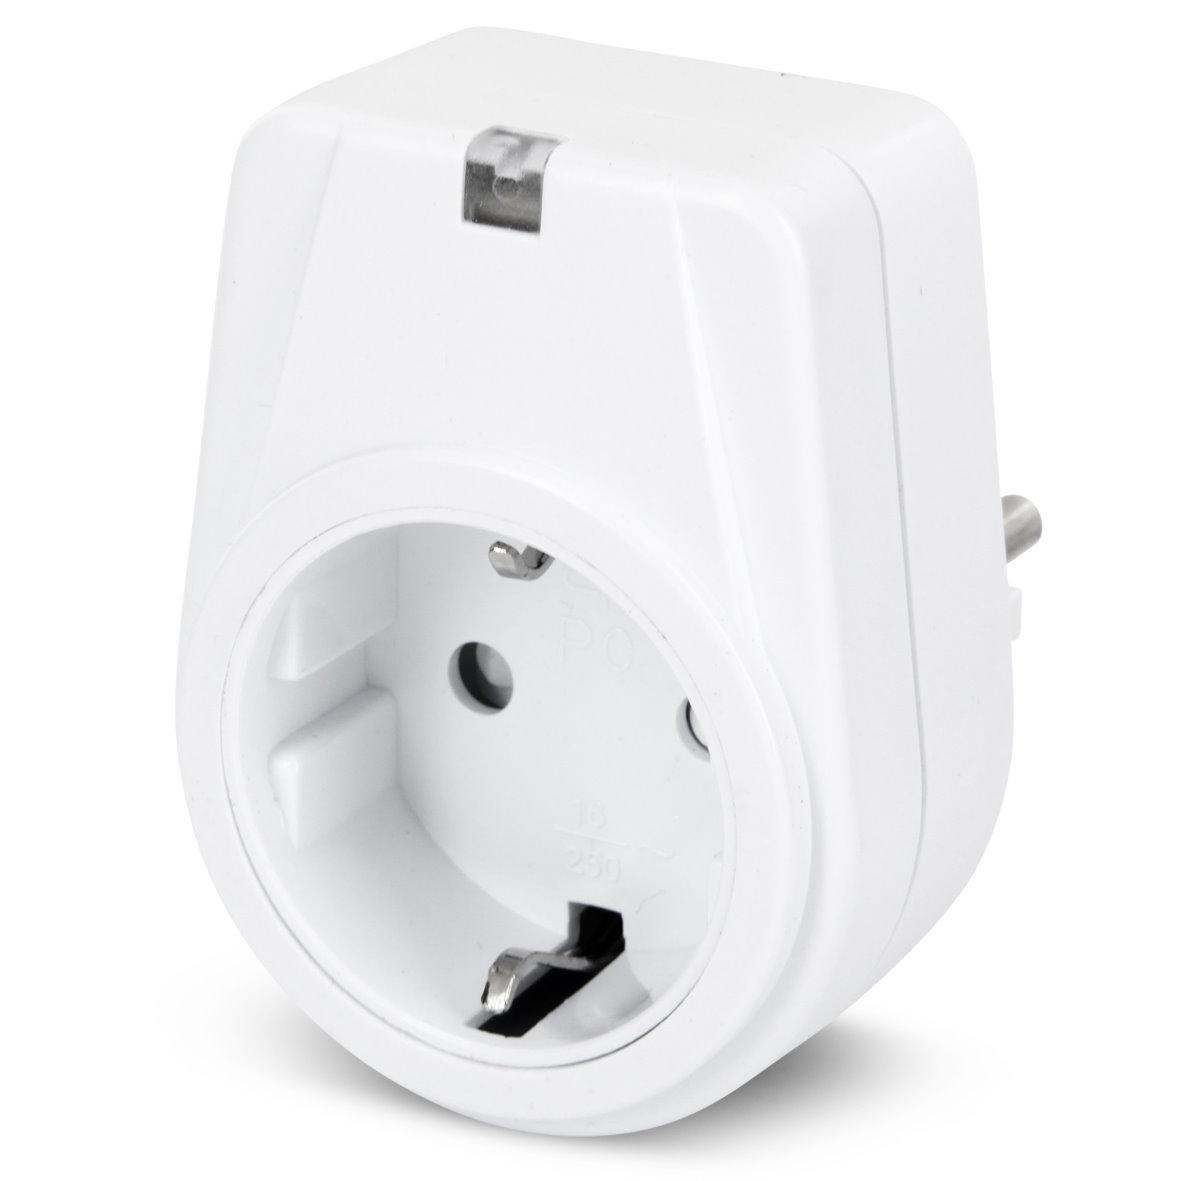 Funkschalter-System-230V-2000W-433Mhz-Funk-LED-Modul-Licht-Taster-Schalter